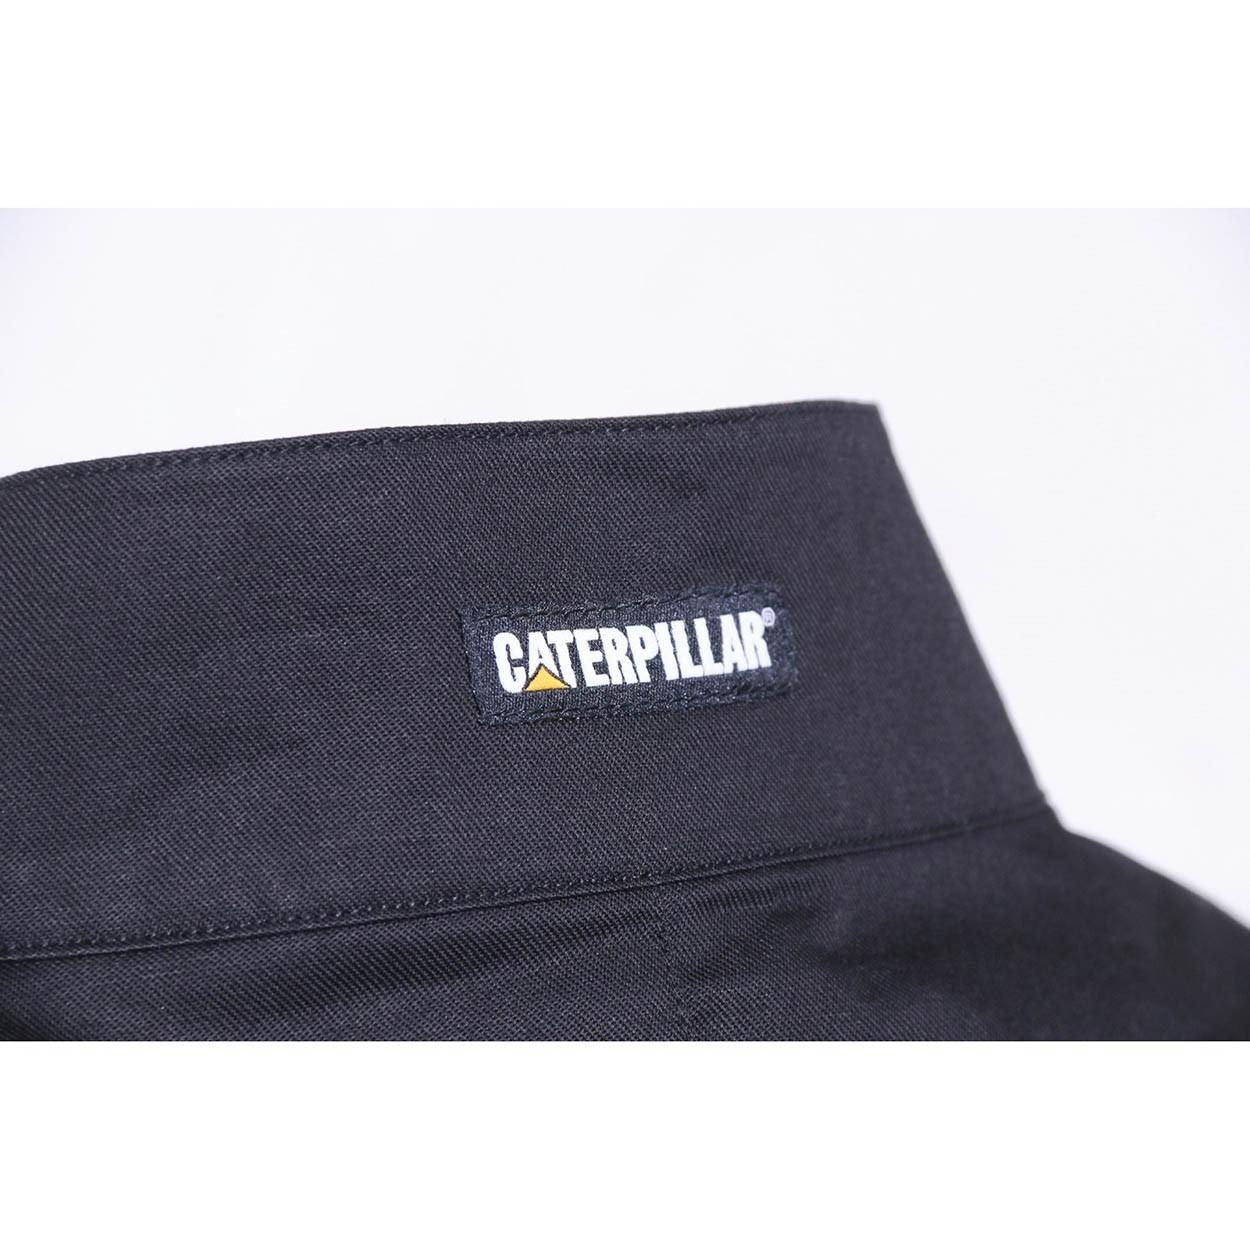 Caterpillar-Mens-Tactical-Work-Shirt-FS4644 thumbnail 7